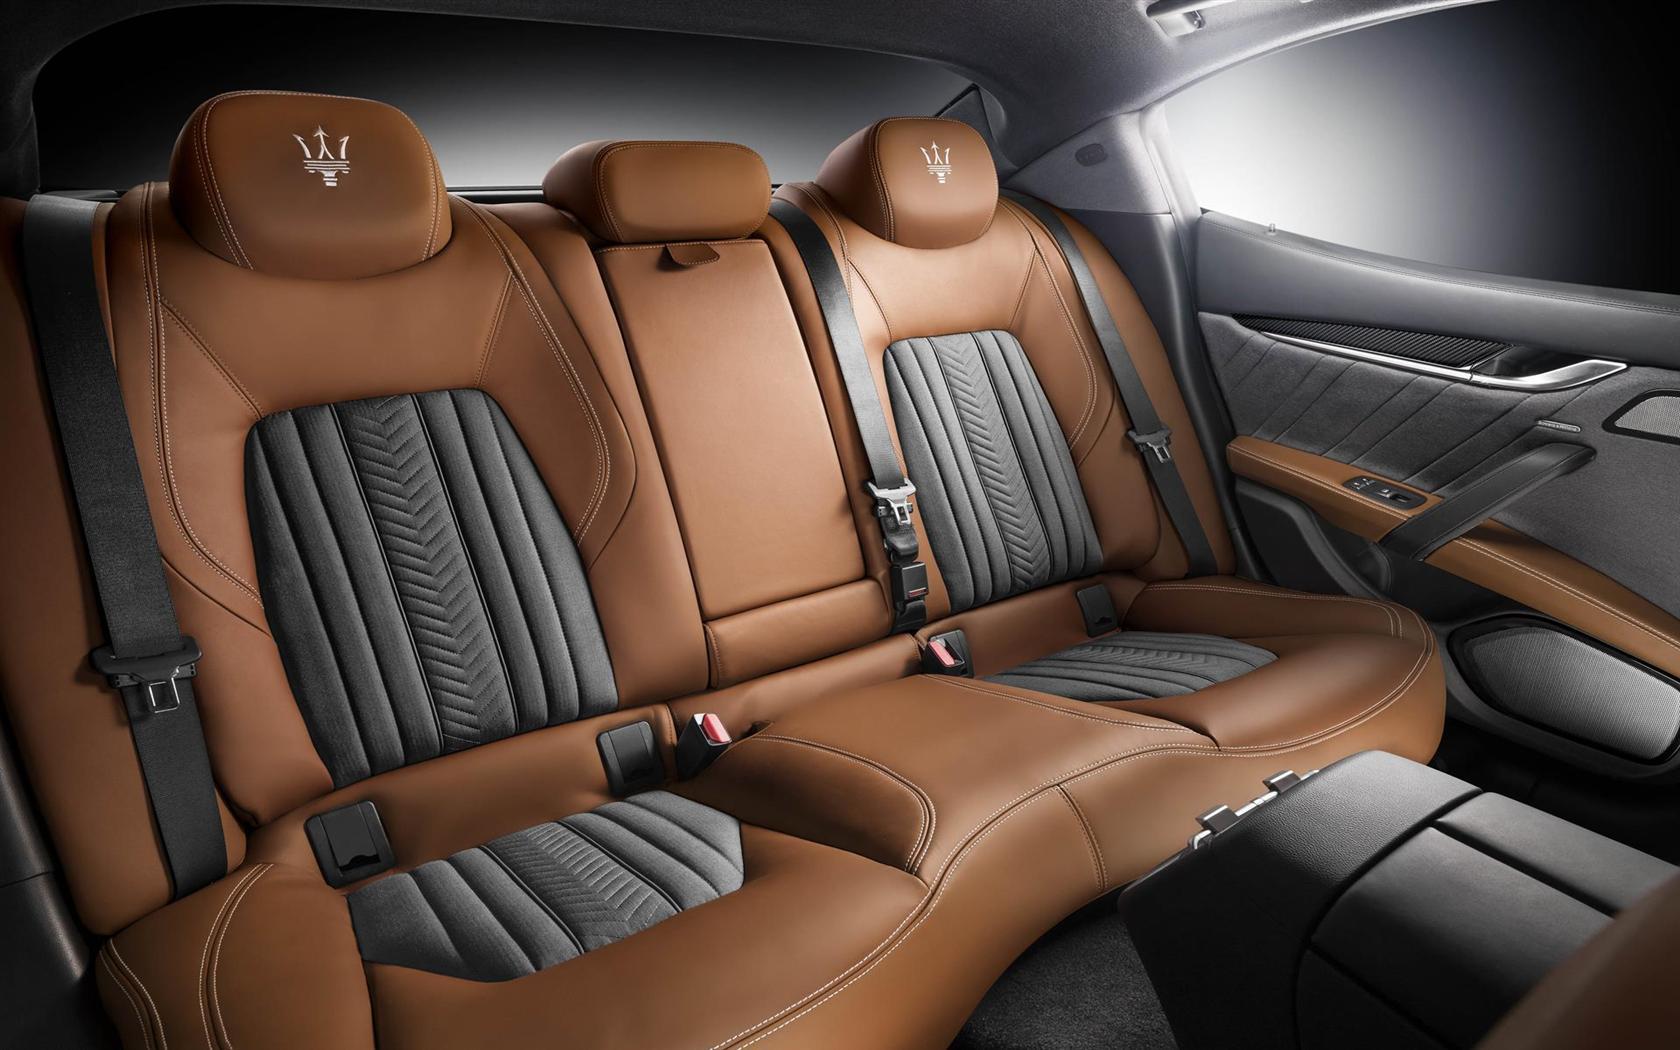 https://www.conceptcarz.com/images/Maserati/Maserati-Ghibli-Ermenegildo-i08-1680.jpg